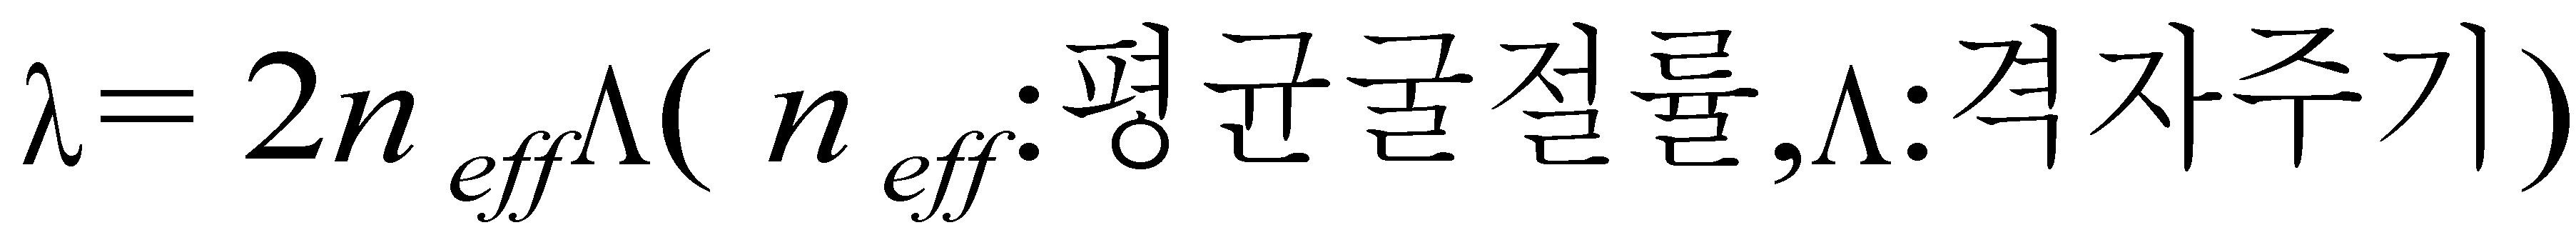 Figure 112003019847501-pat00001